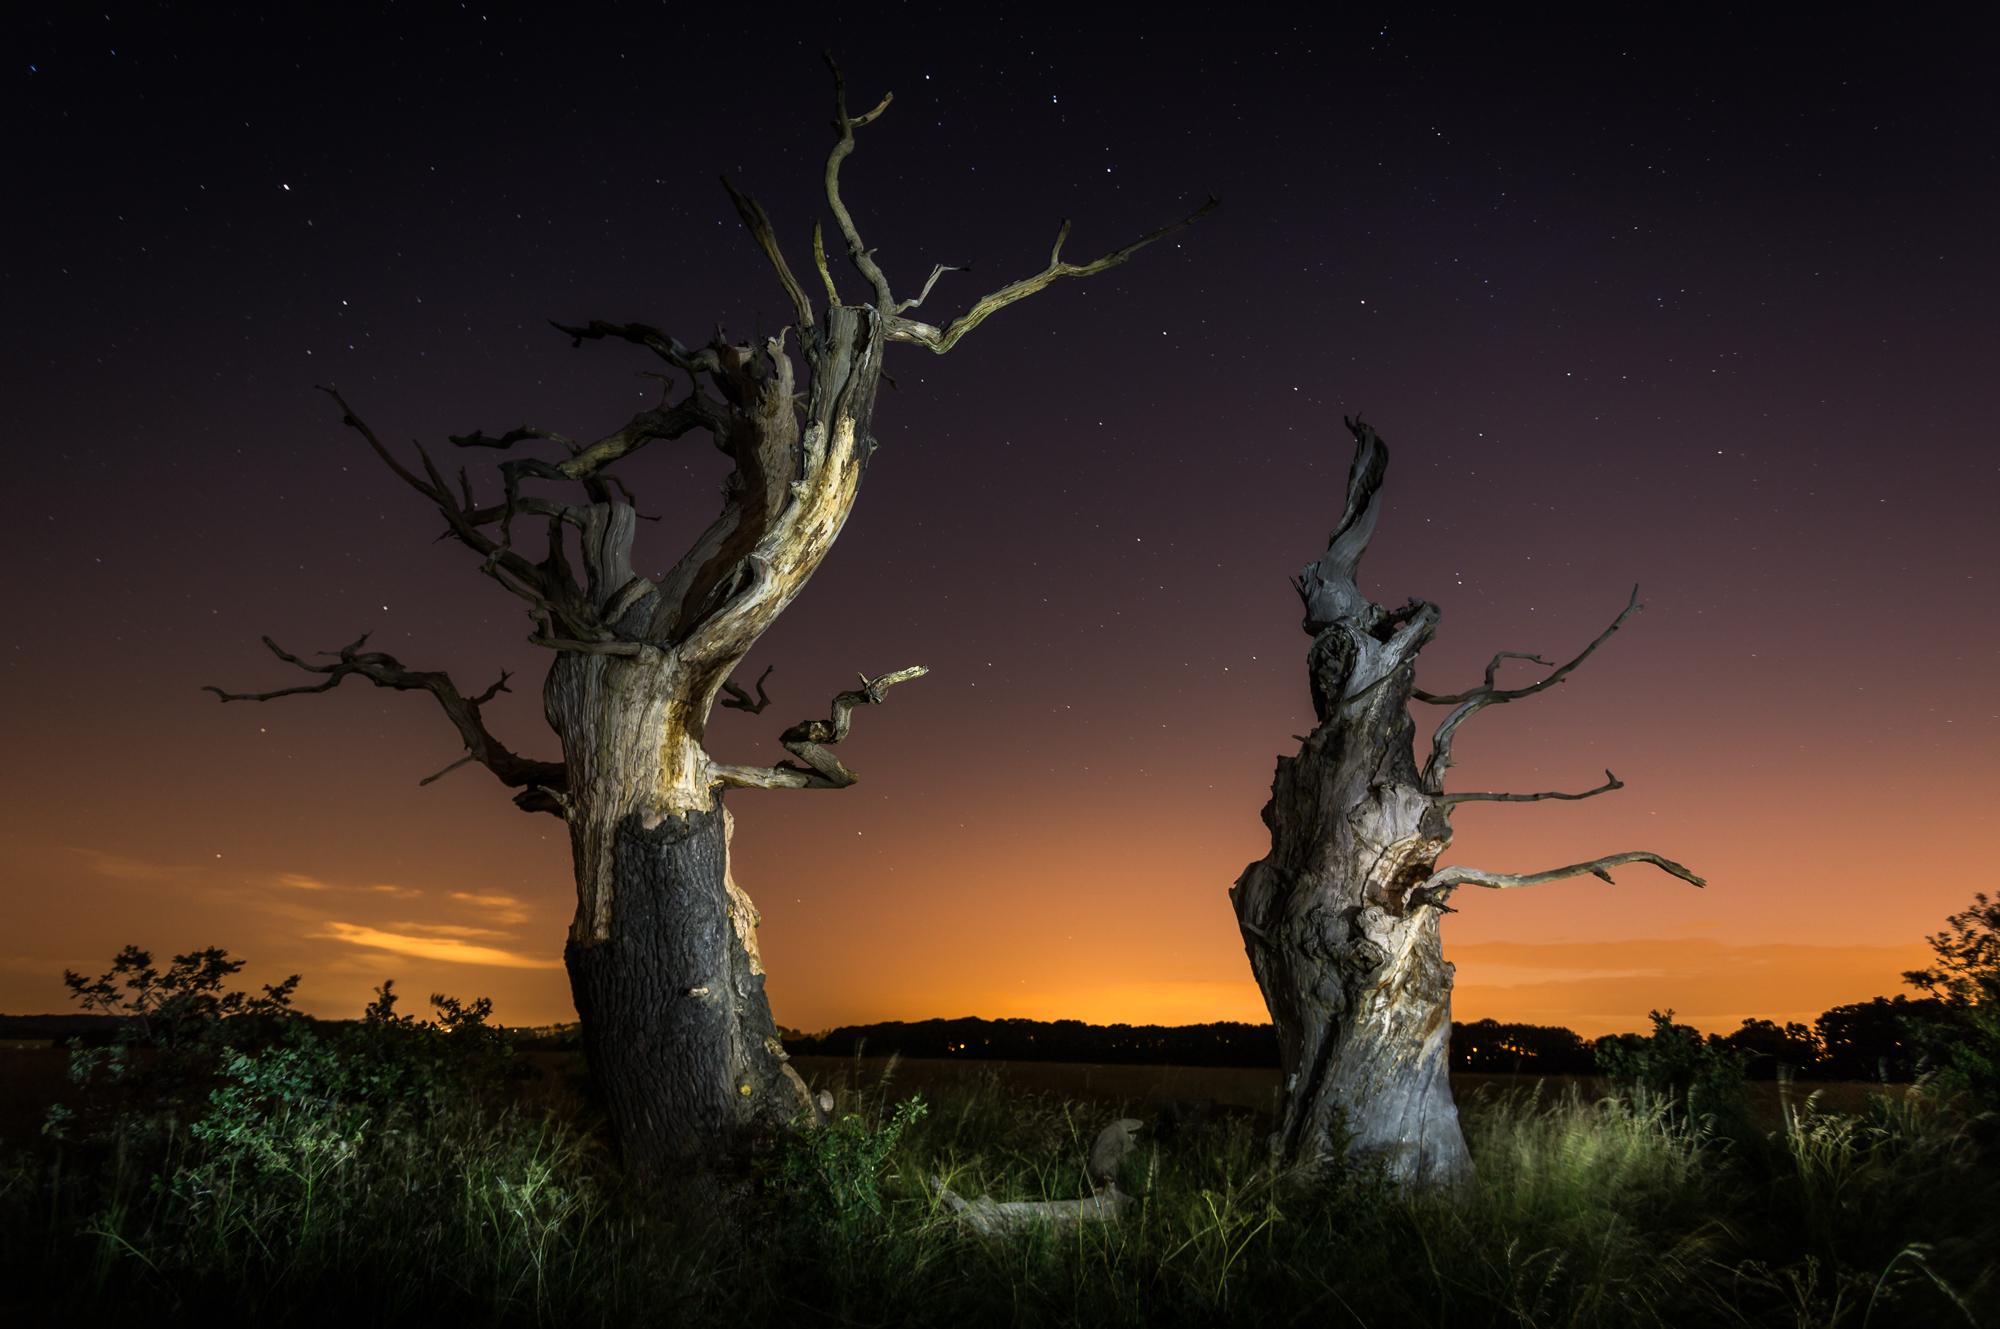 Trees Night-240-Edit.jpg